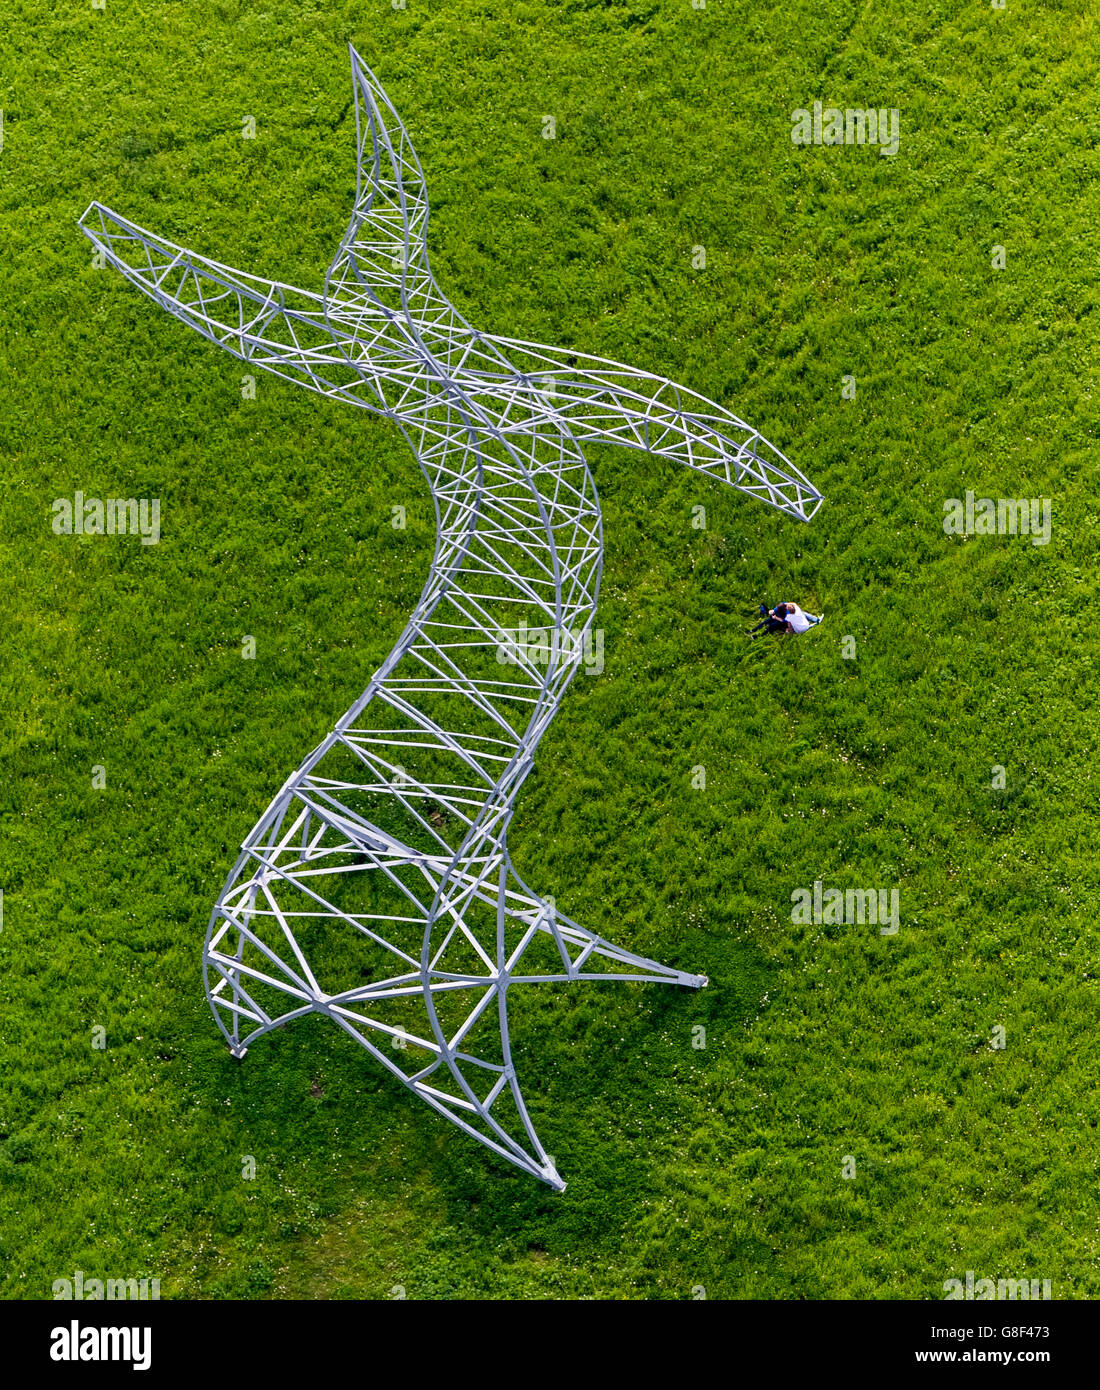 Aerial view, Berlin artist group Inge for EMSCHERKUNST.2013, power mast in the Ripshorster Emscher meadows, - Stock Image